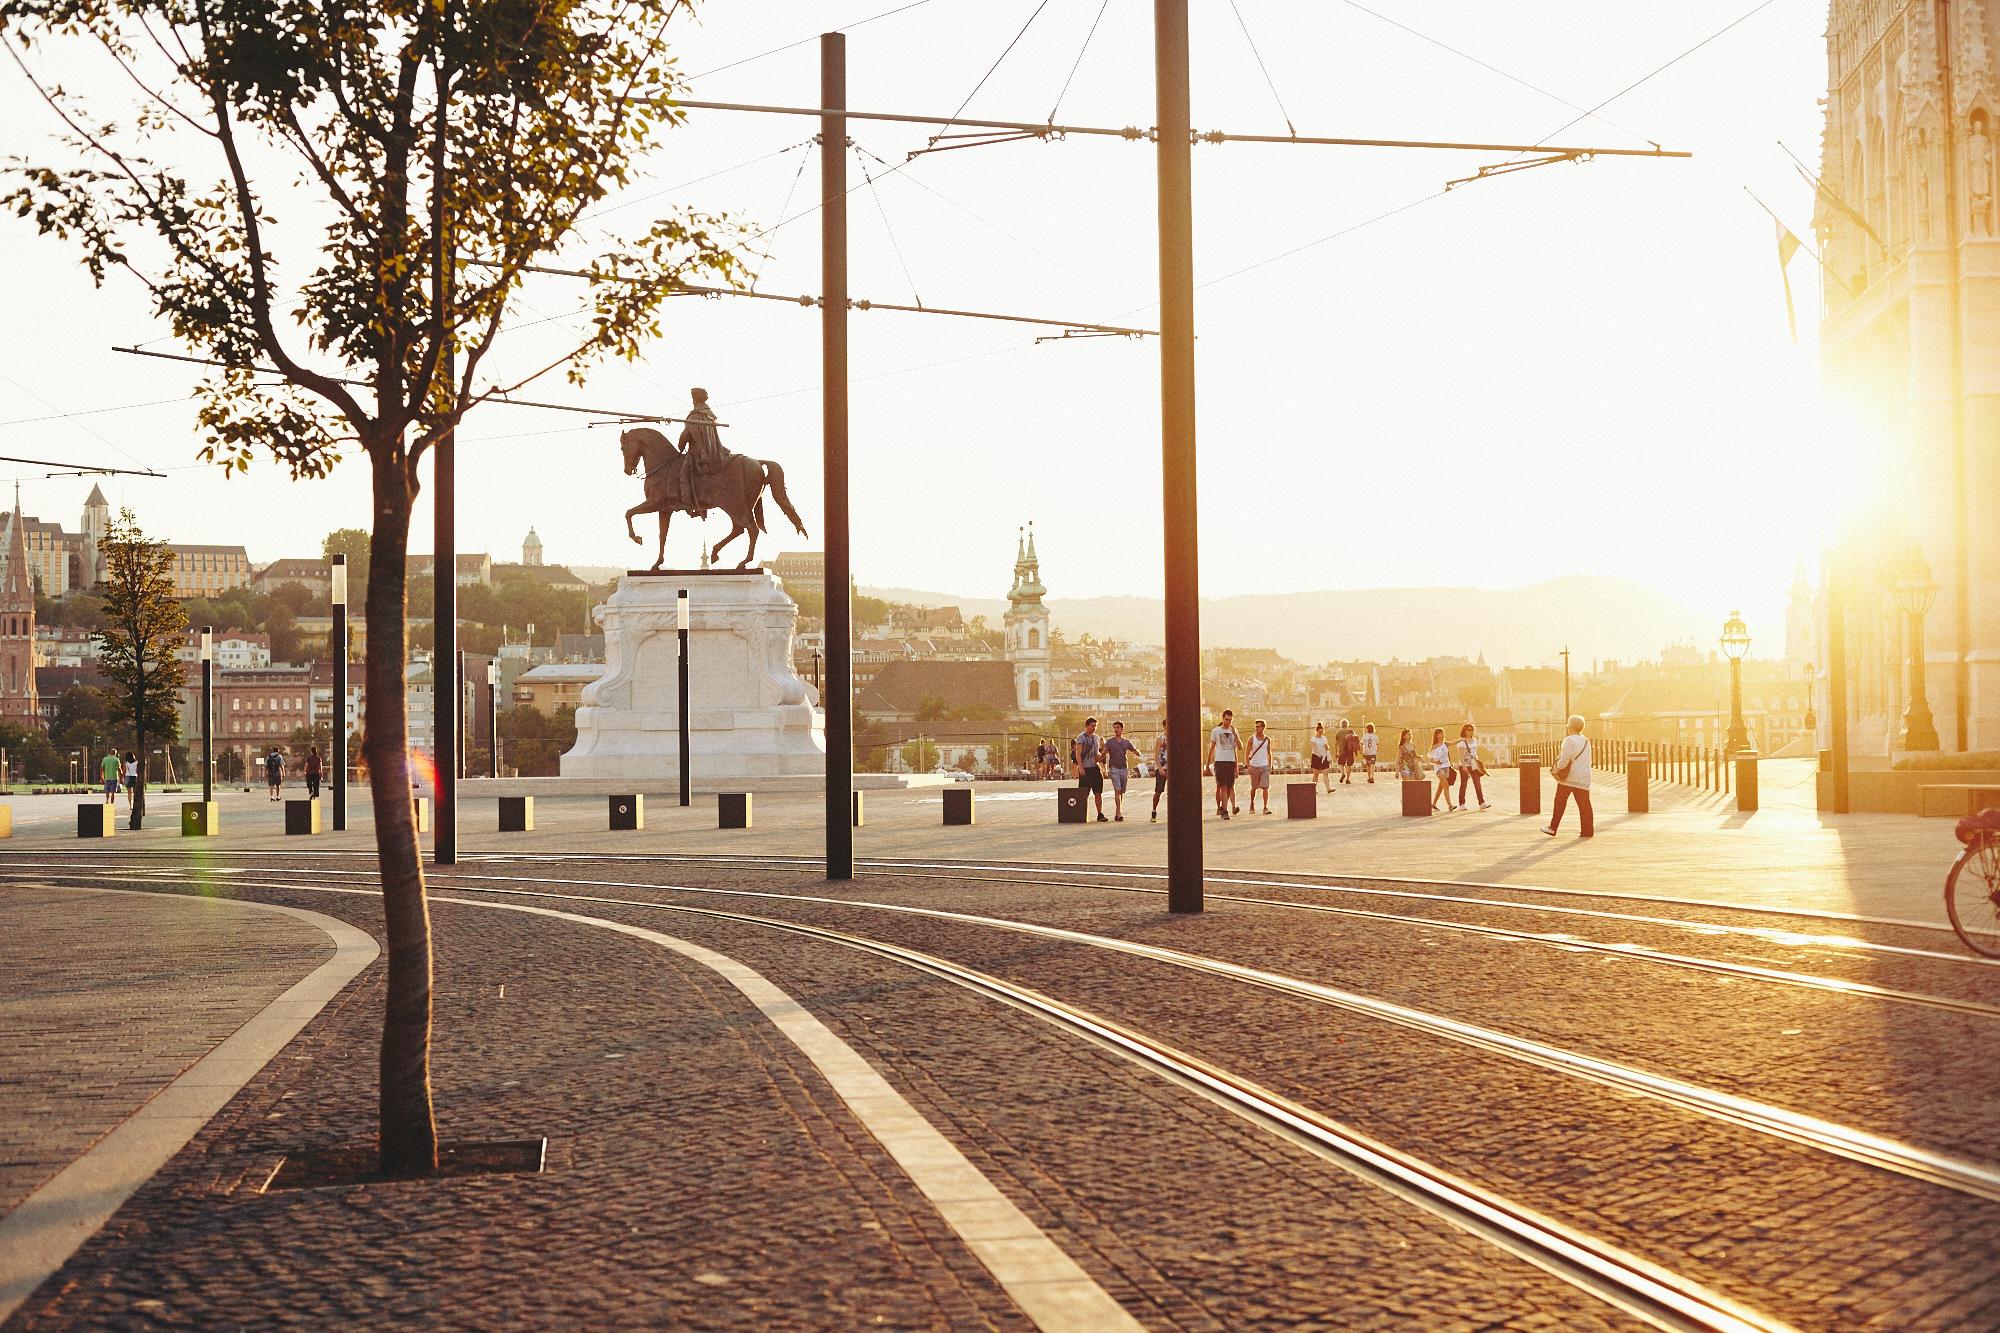 maxmotel_budapest_aug2015_day01_09_parliament_evening_0454